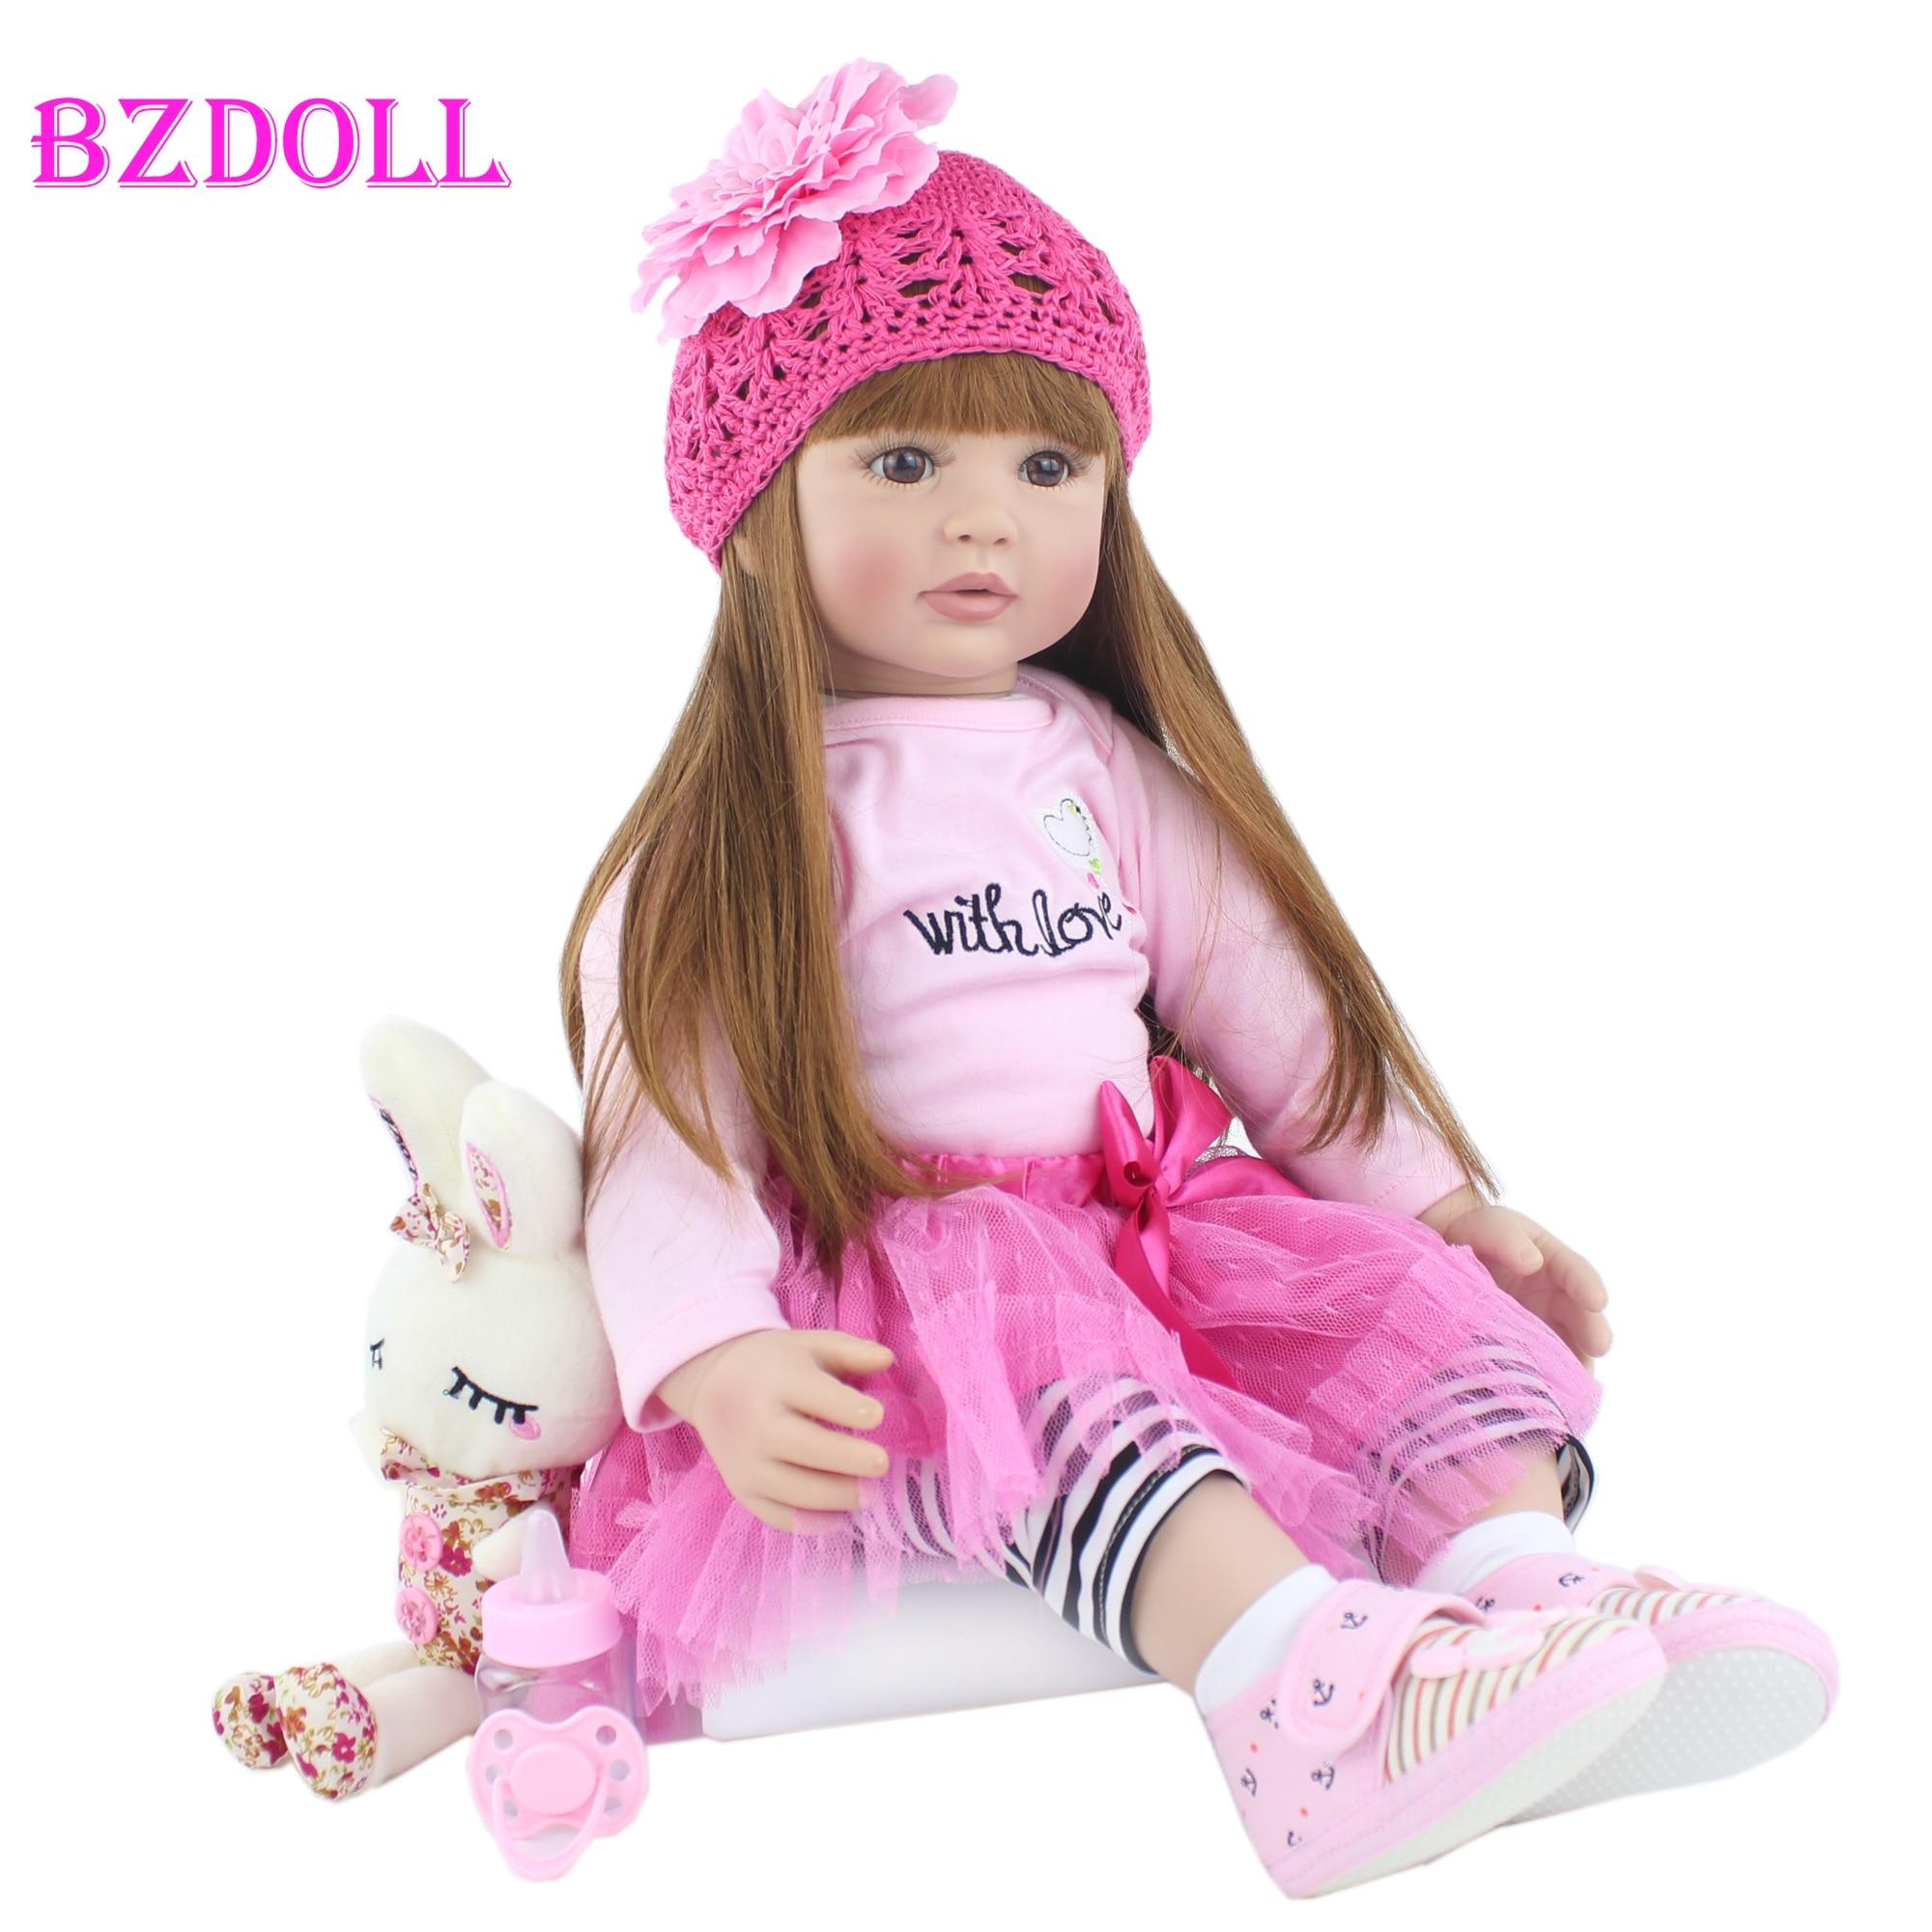 60cm Silicone Reborn Baby Doll Toy Realistic Vinyl Princess Toddler Bebe Child Birthday Gift Girl Babies Boneca Brinquedo